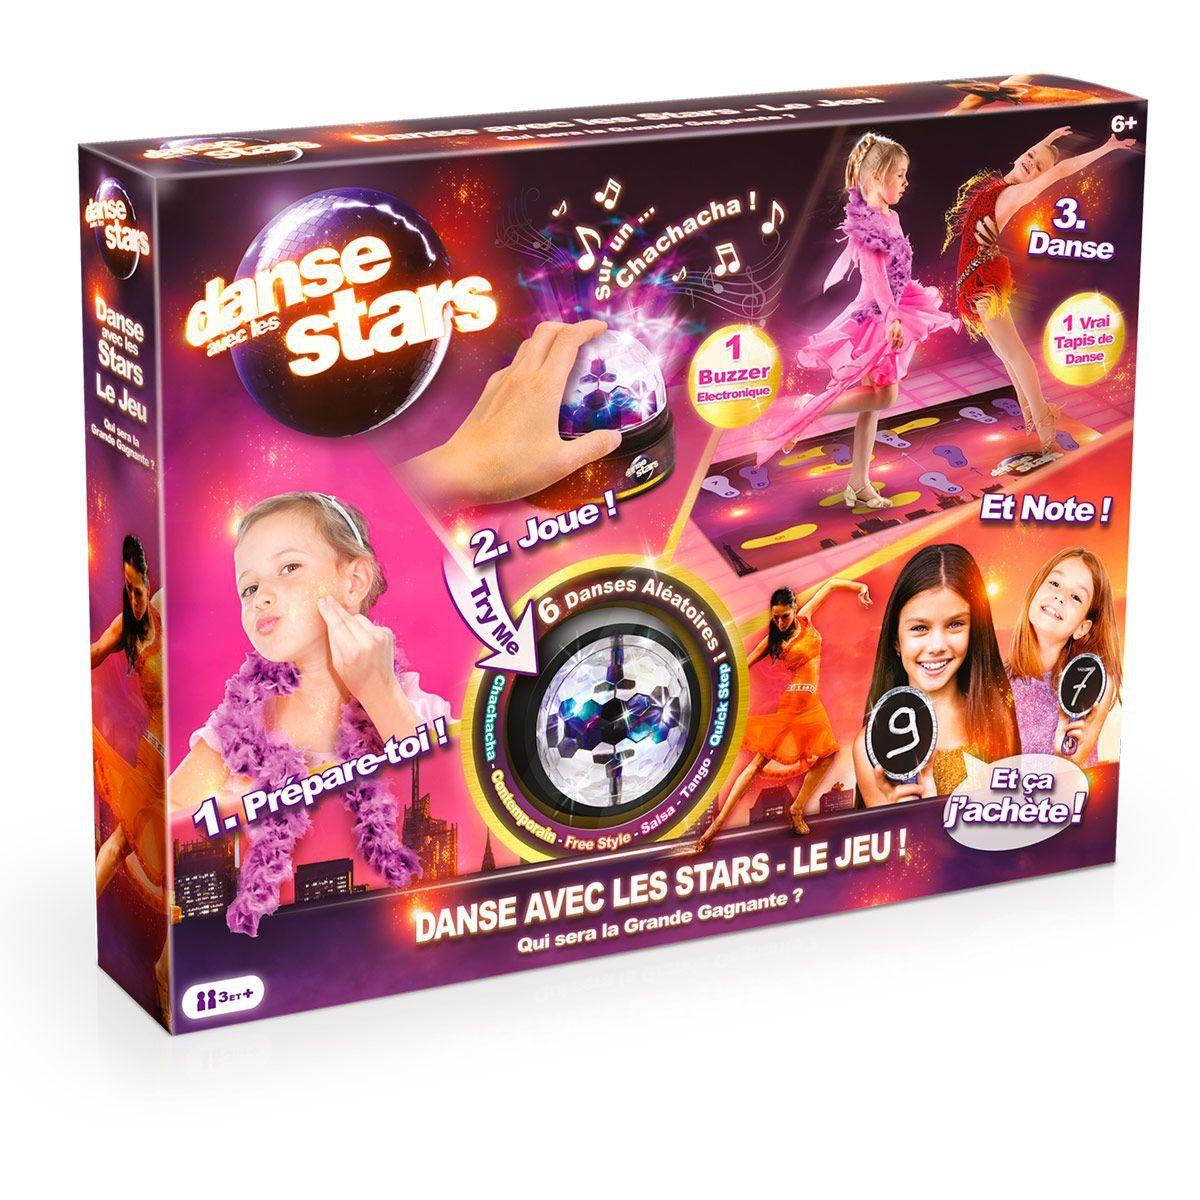 Danse avec les stars le jeu (With images) | Kids, Fun, Electronic products